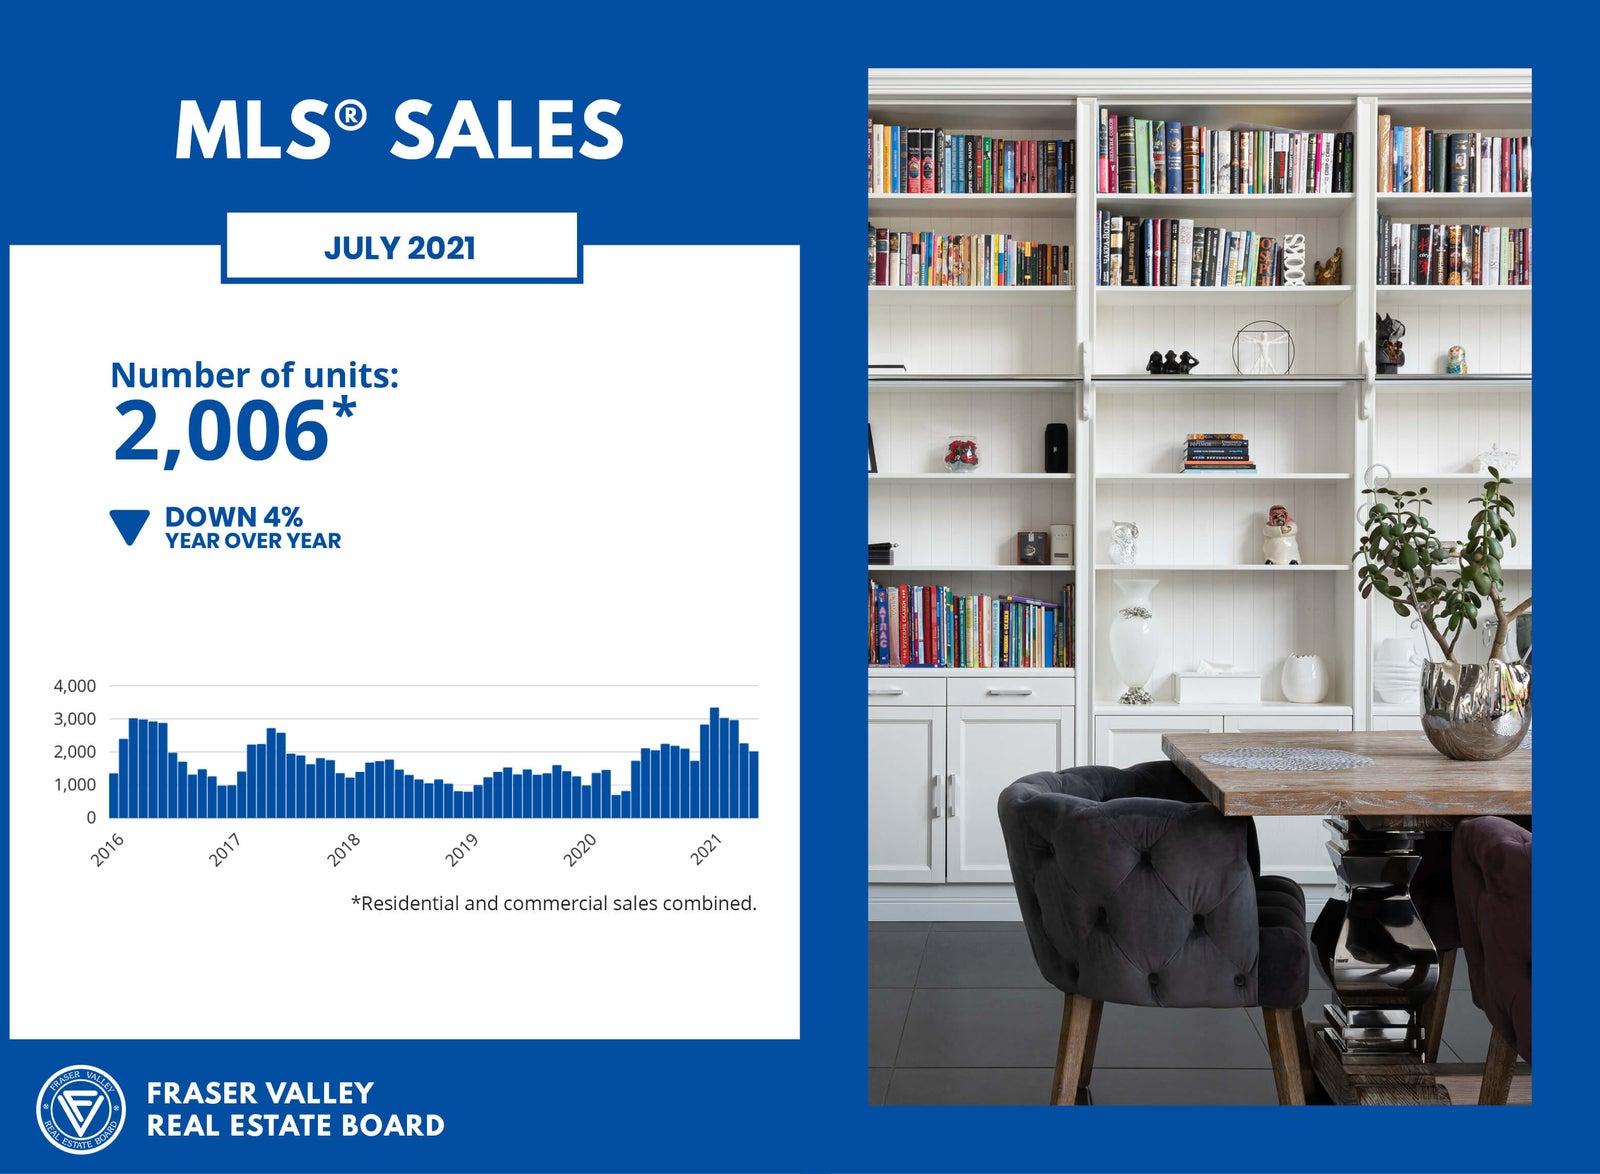 MLS Sales for July 2021 - Fraser Valley Housing Market